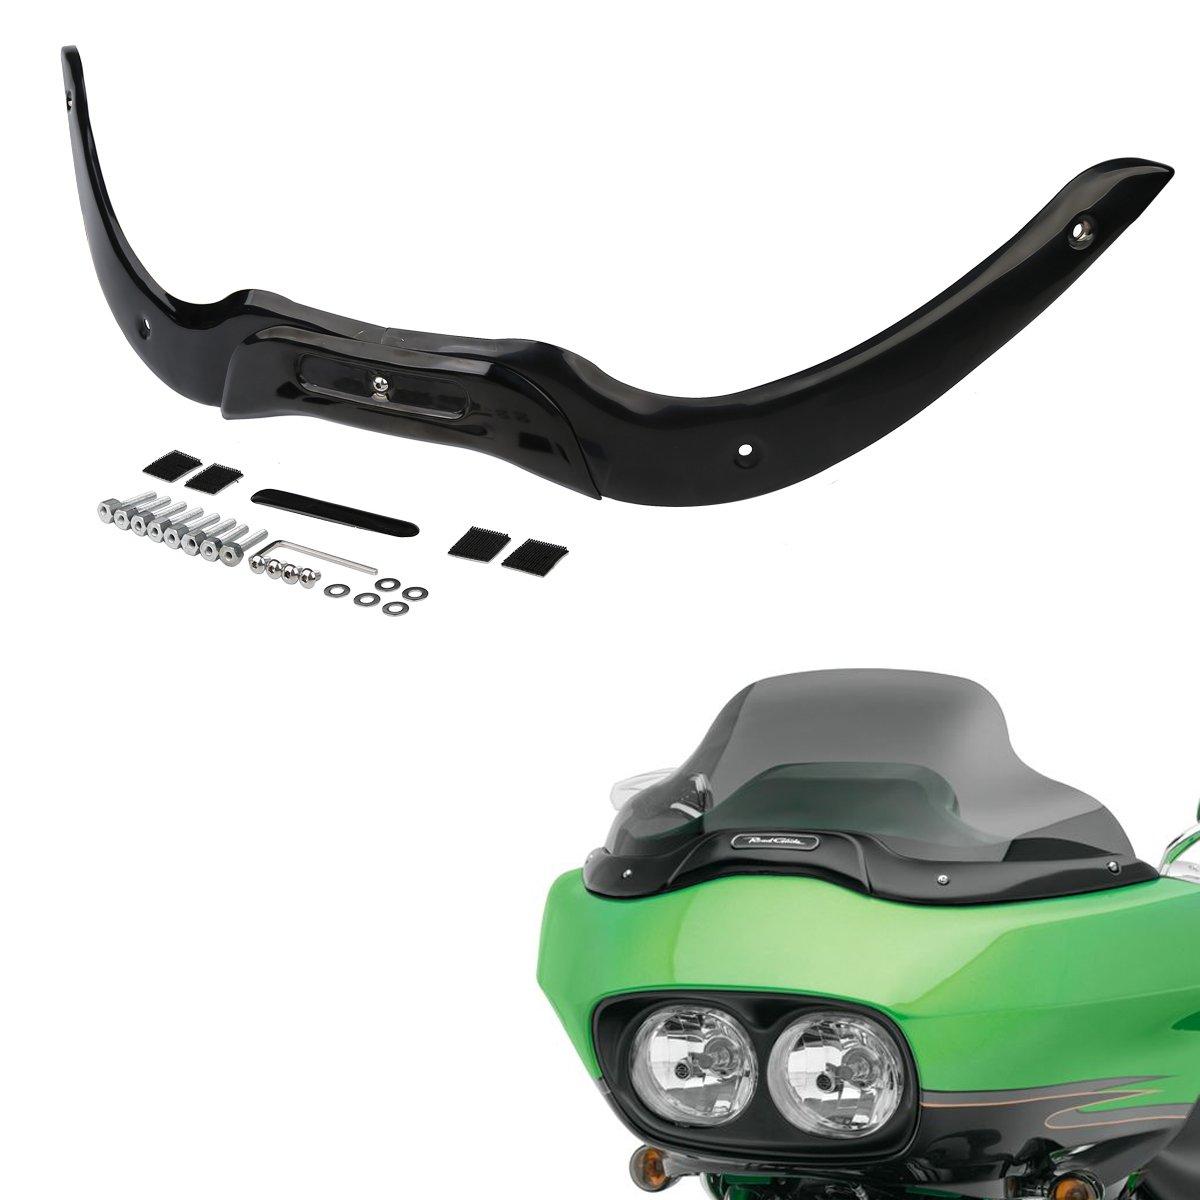 XMT-MOTO Black Iron Windshield Windscreen Trim For Harley-Davidson Touring Road Glide models 2004-2013